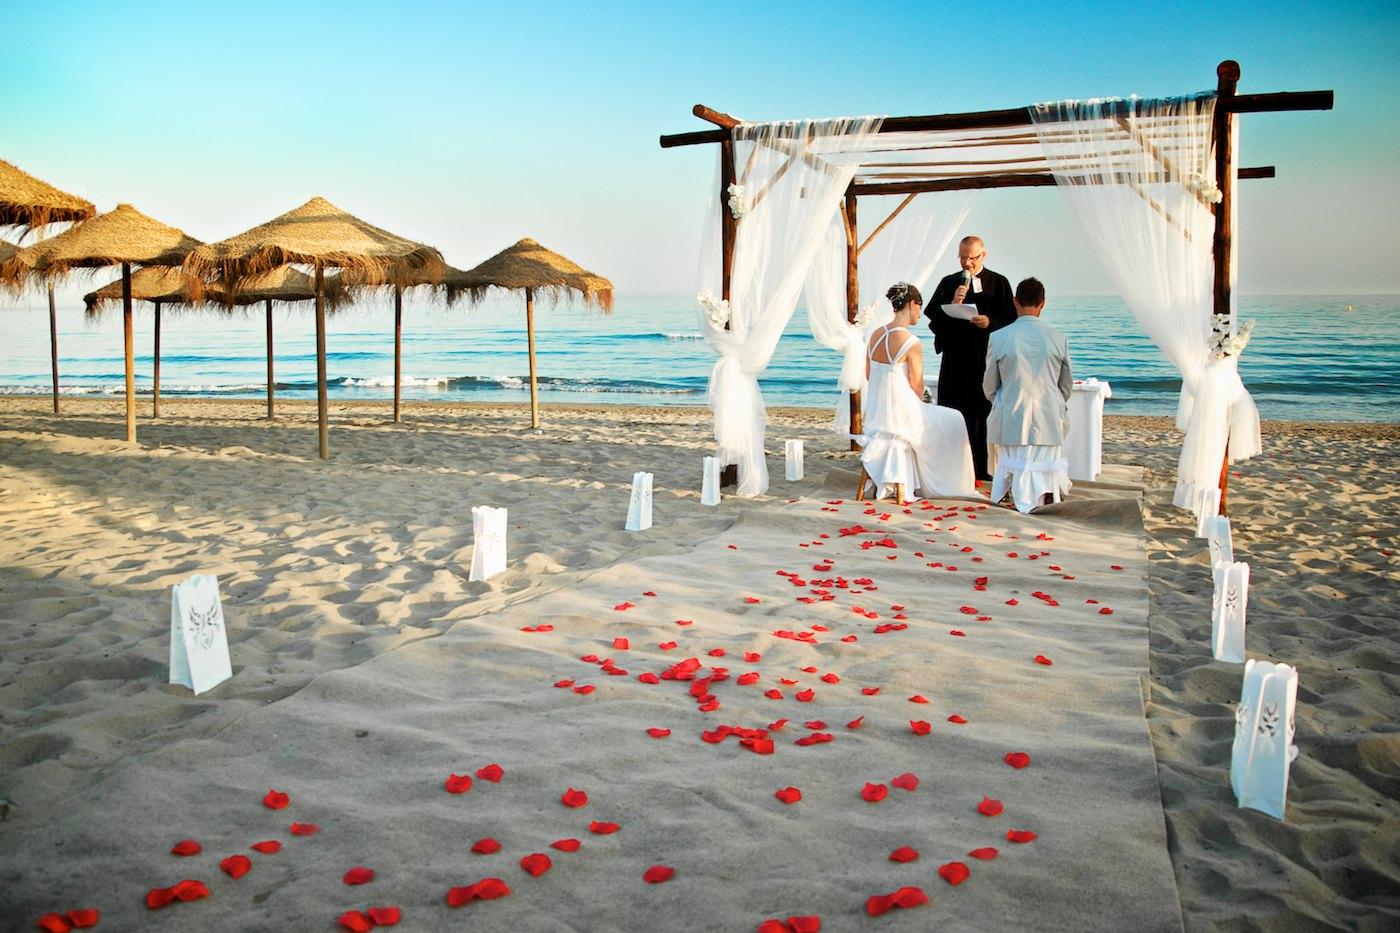 Wedding At The Beach: Wedding Destinations: Beach Weddings